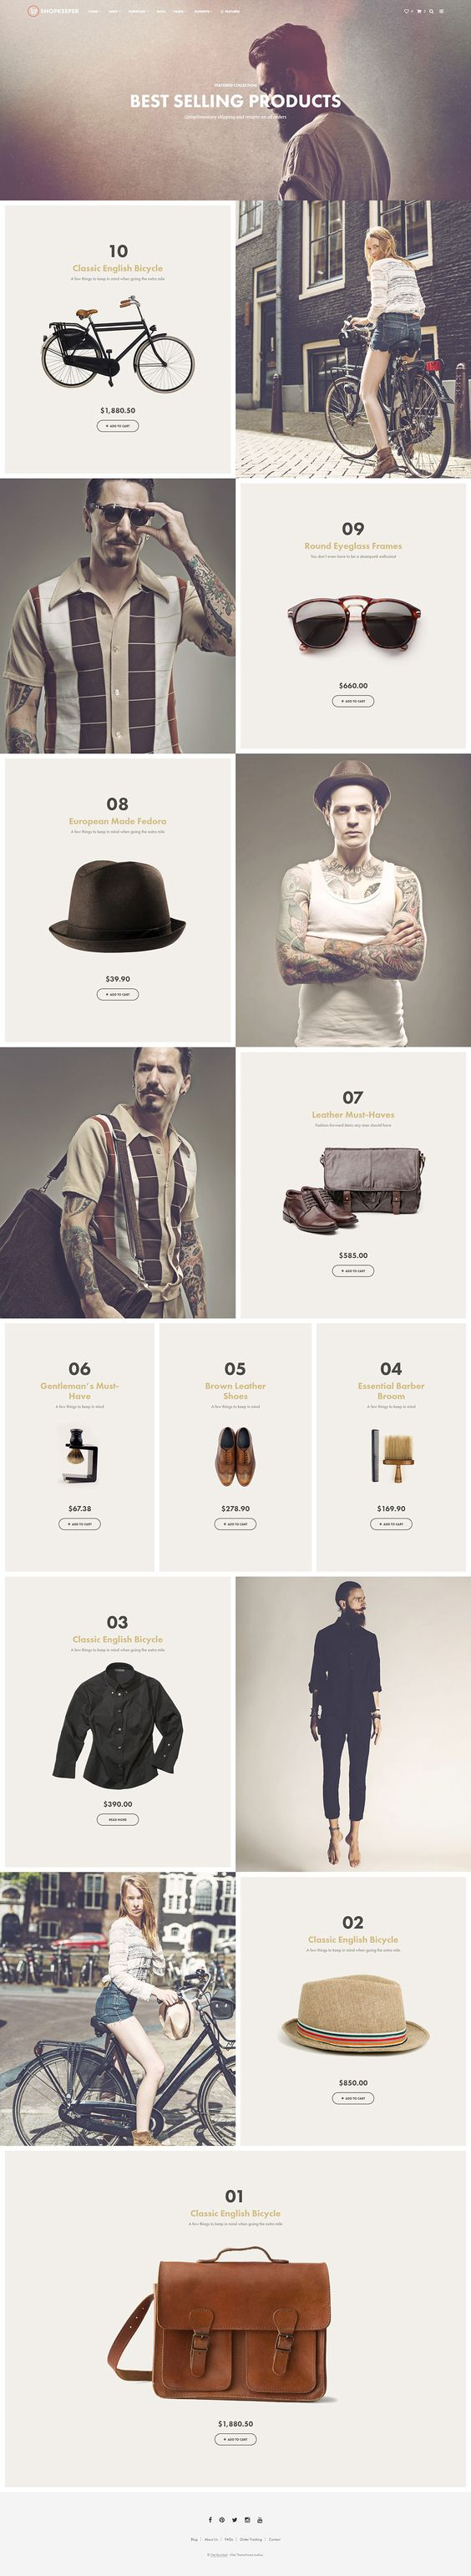 Shopkeeper - Responsive WordPress Theme - WordPress | ThemeForest